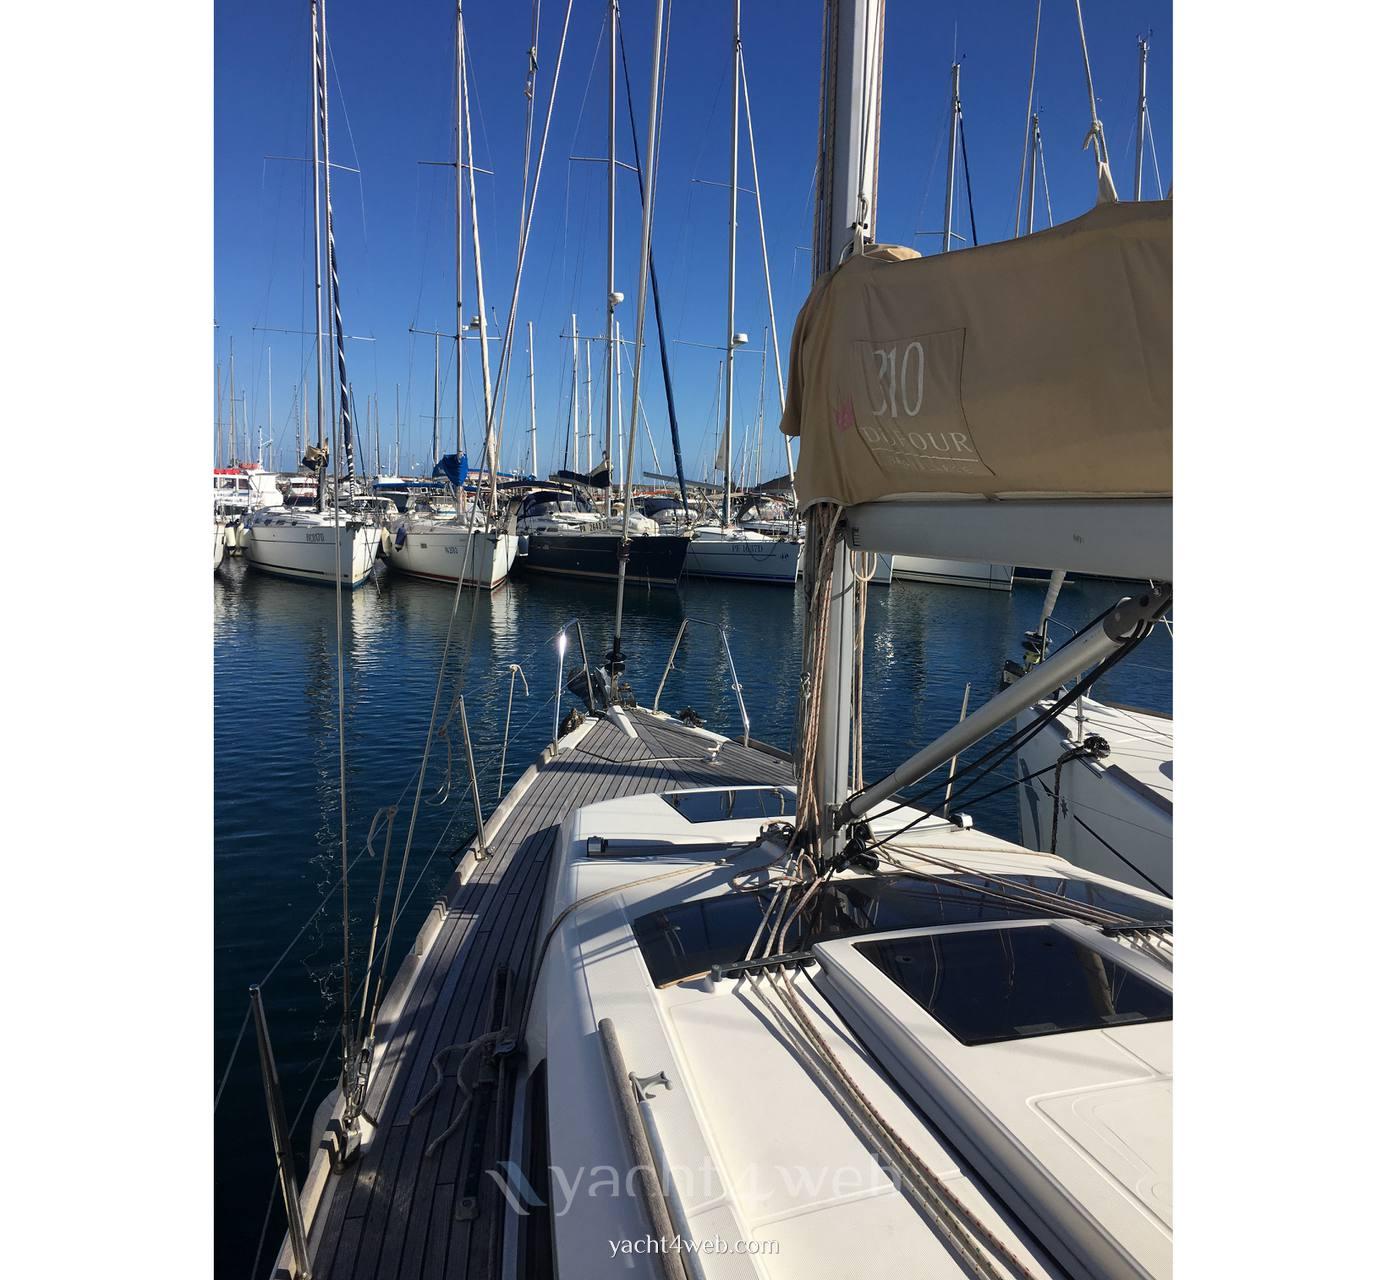 Dufour Yachts 310 grand large Sail cruiser